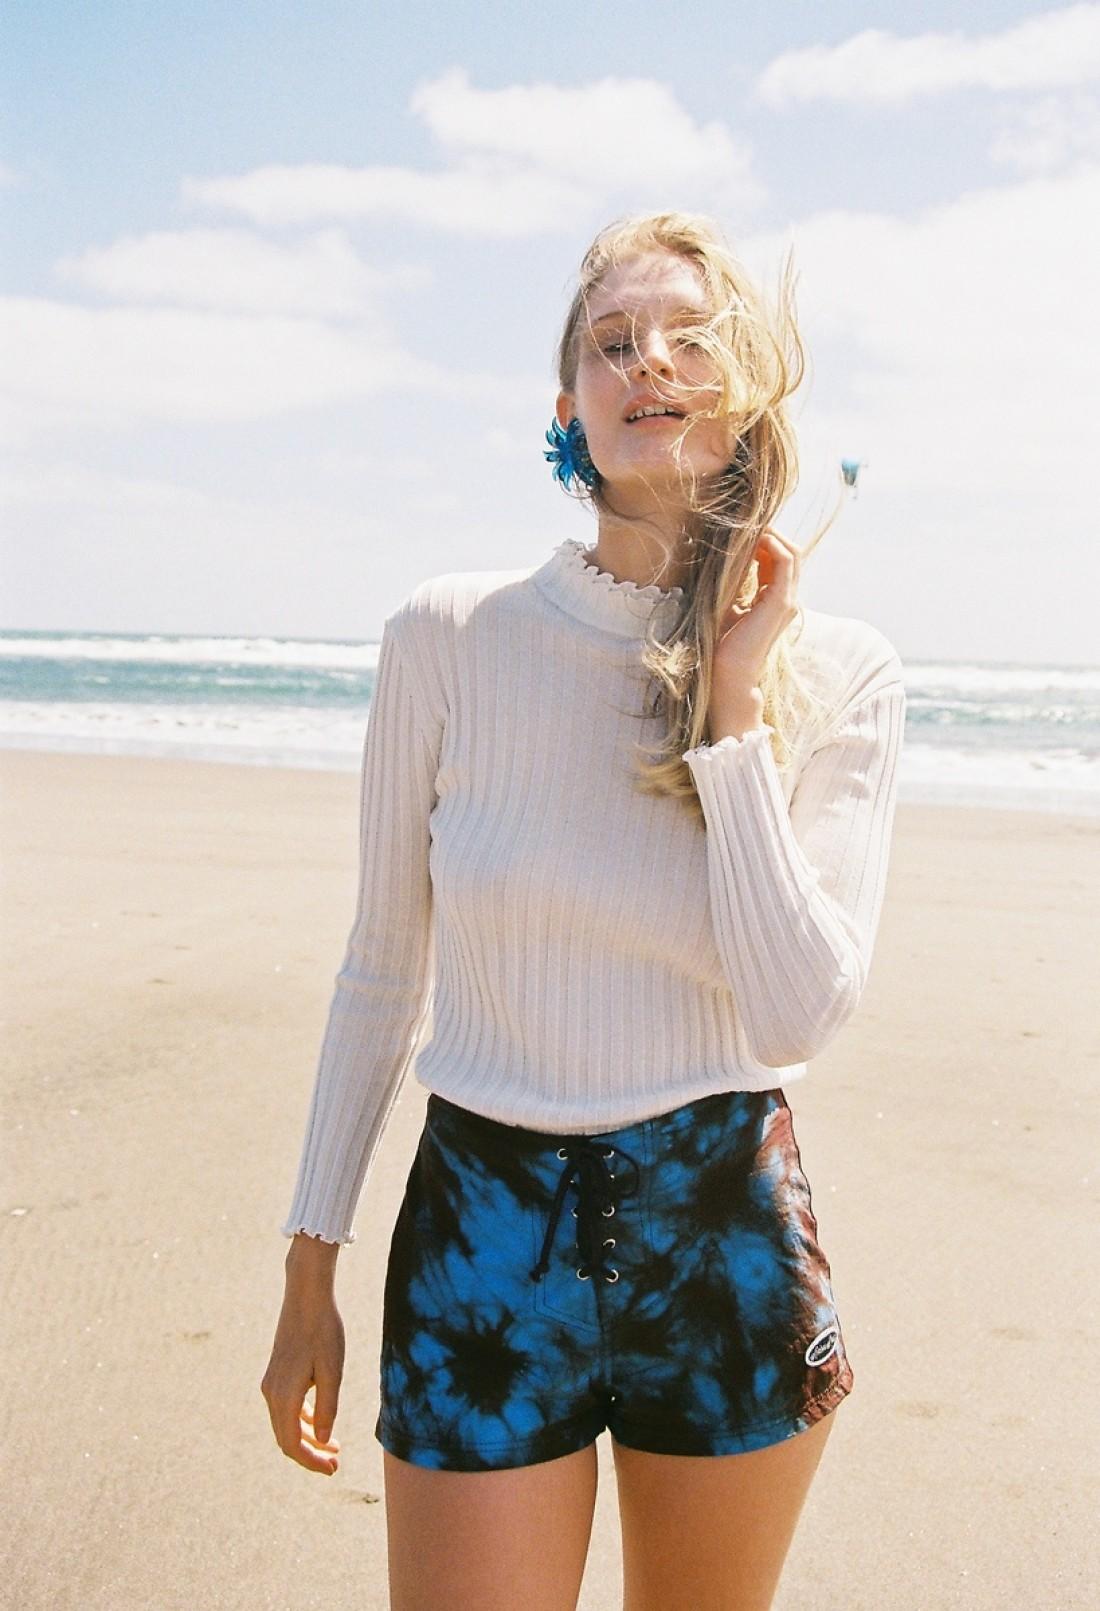 Jade photographed by Zara Mirkin for Nylon Magazine; styling by Paris Mitchell